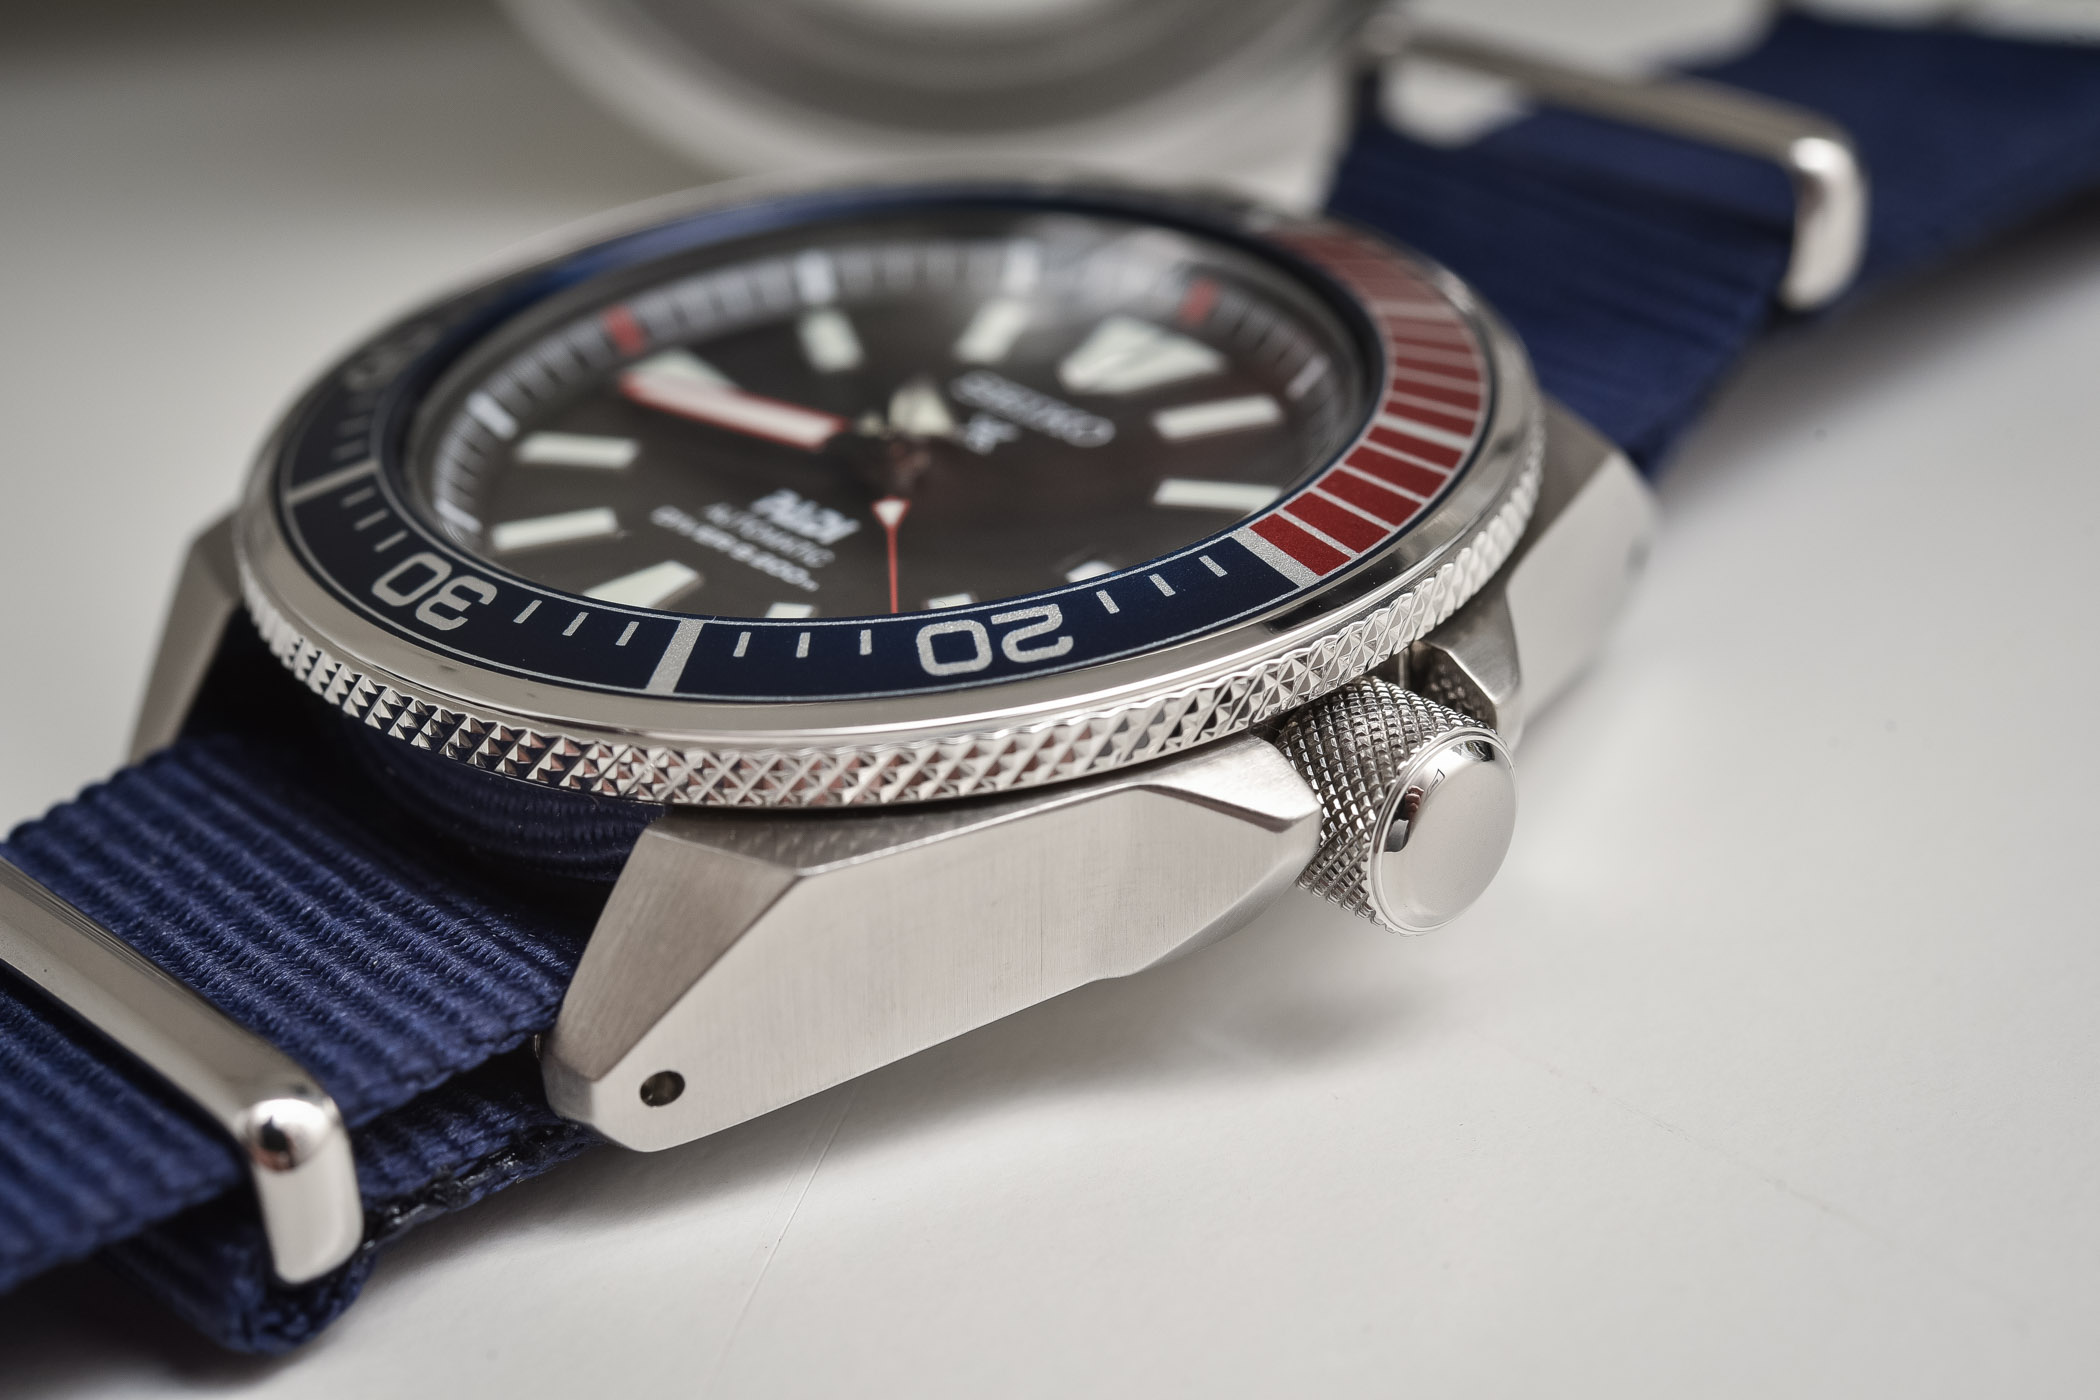 Seiko Prospex Automatic Diver Padi Samurai SRPB99J1 - Review (Specs ... eae77a7016